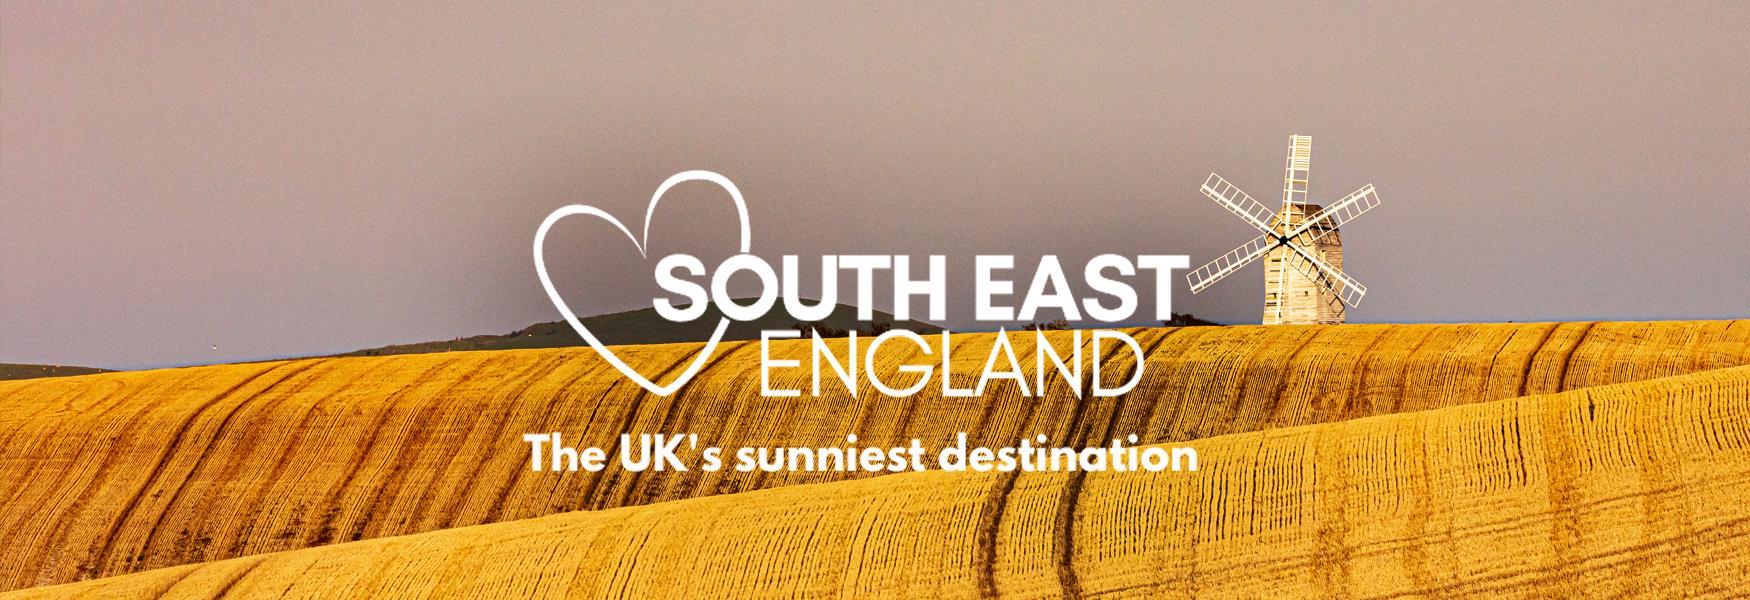 the UKs sunniest destination